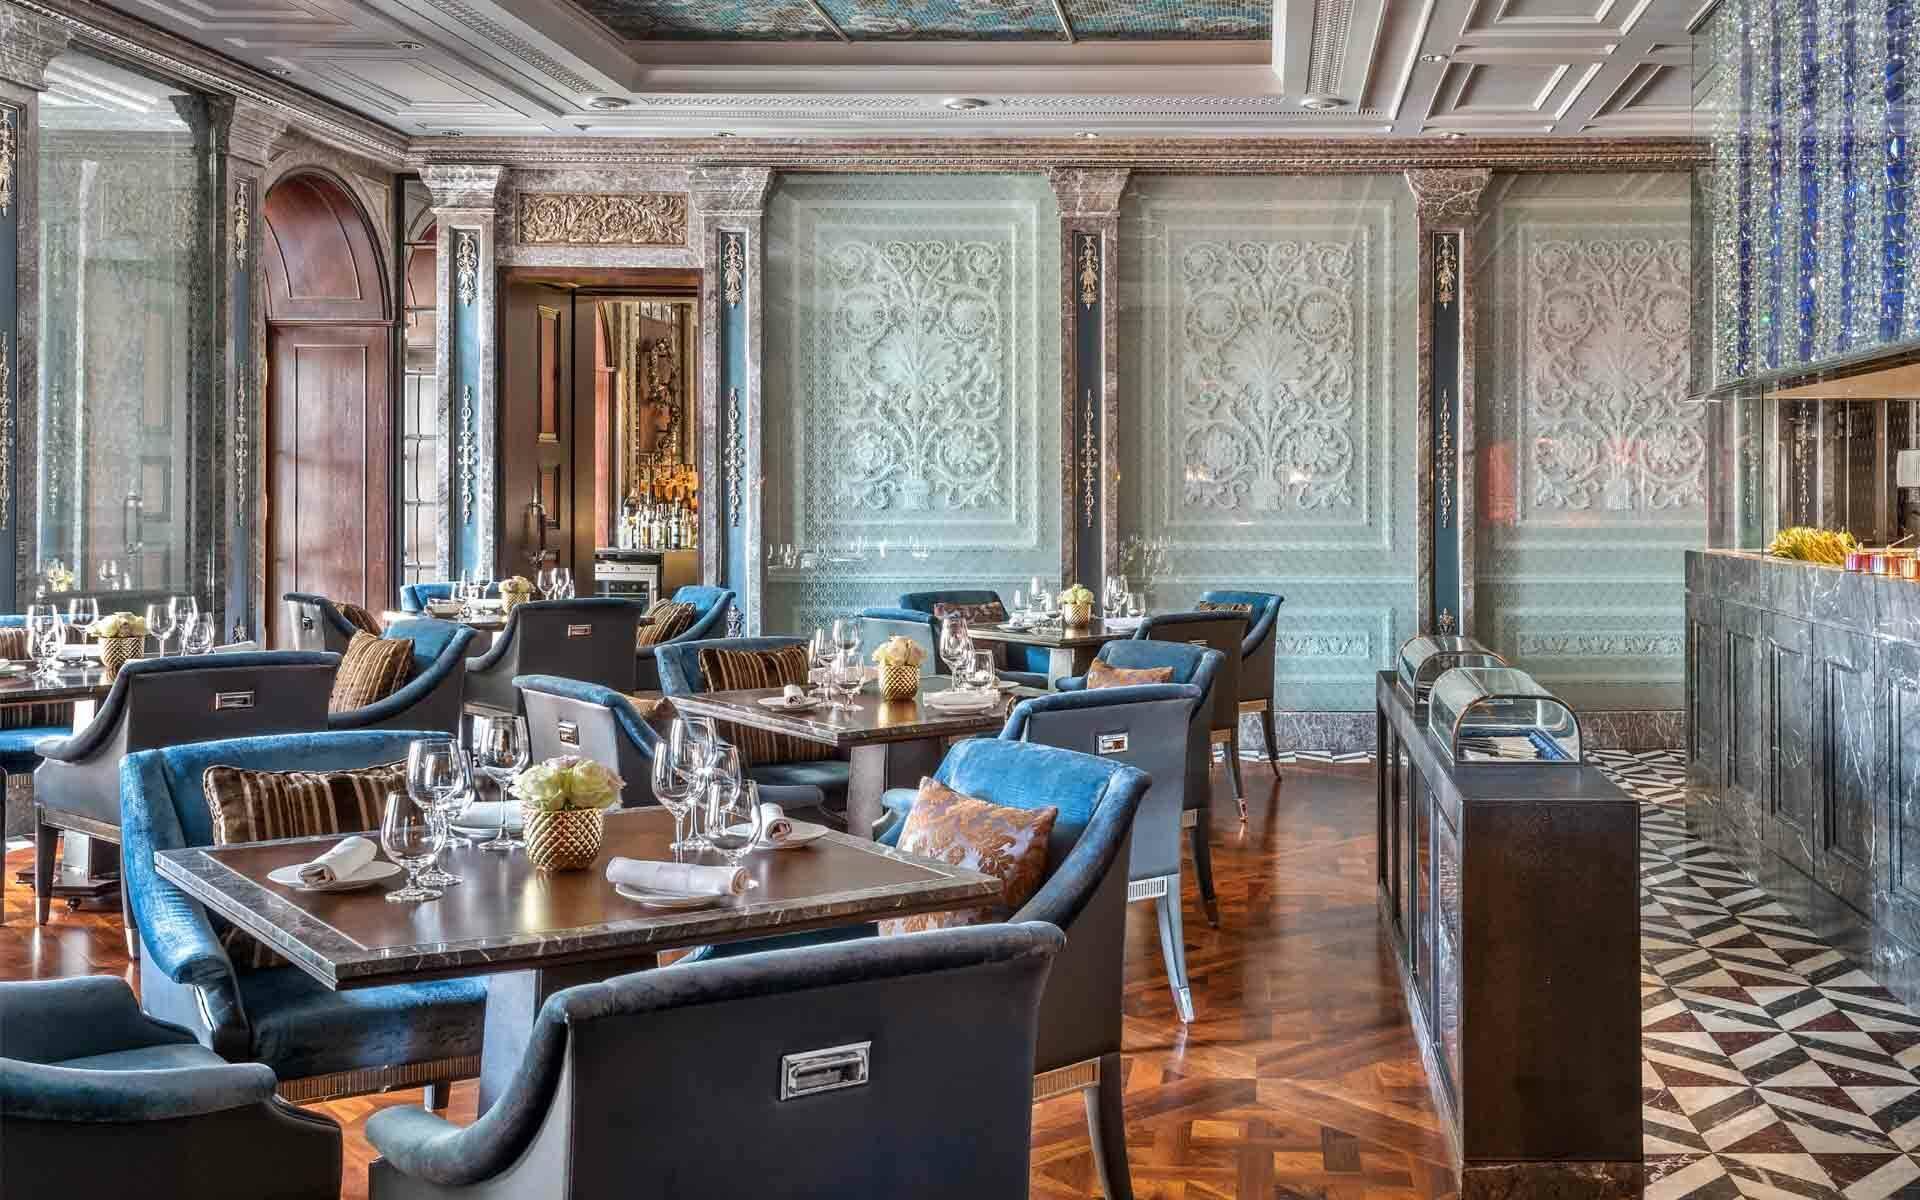 Four Seasons Saint Petersbourg Restaurant